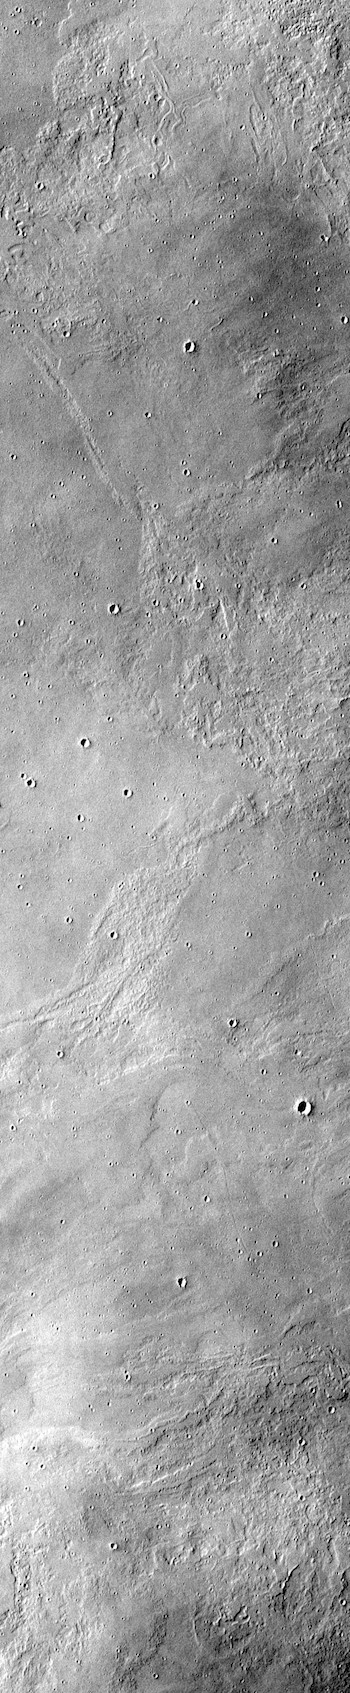 Flows on the caldera floor (THEMIS_IOTD_20180102)